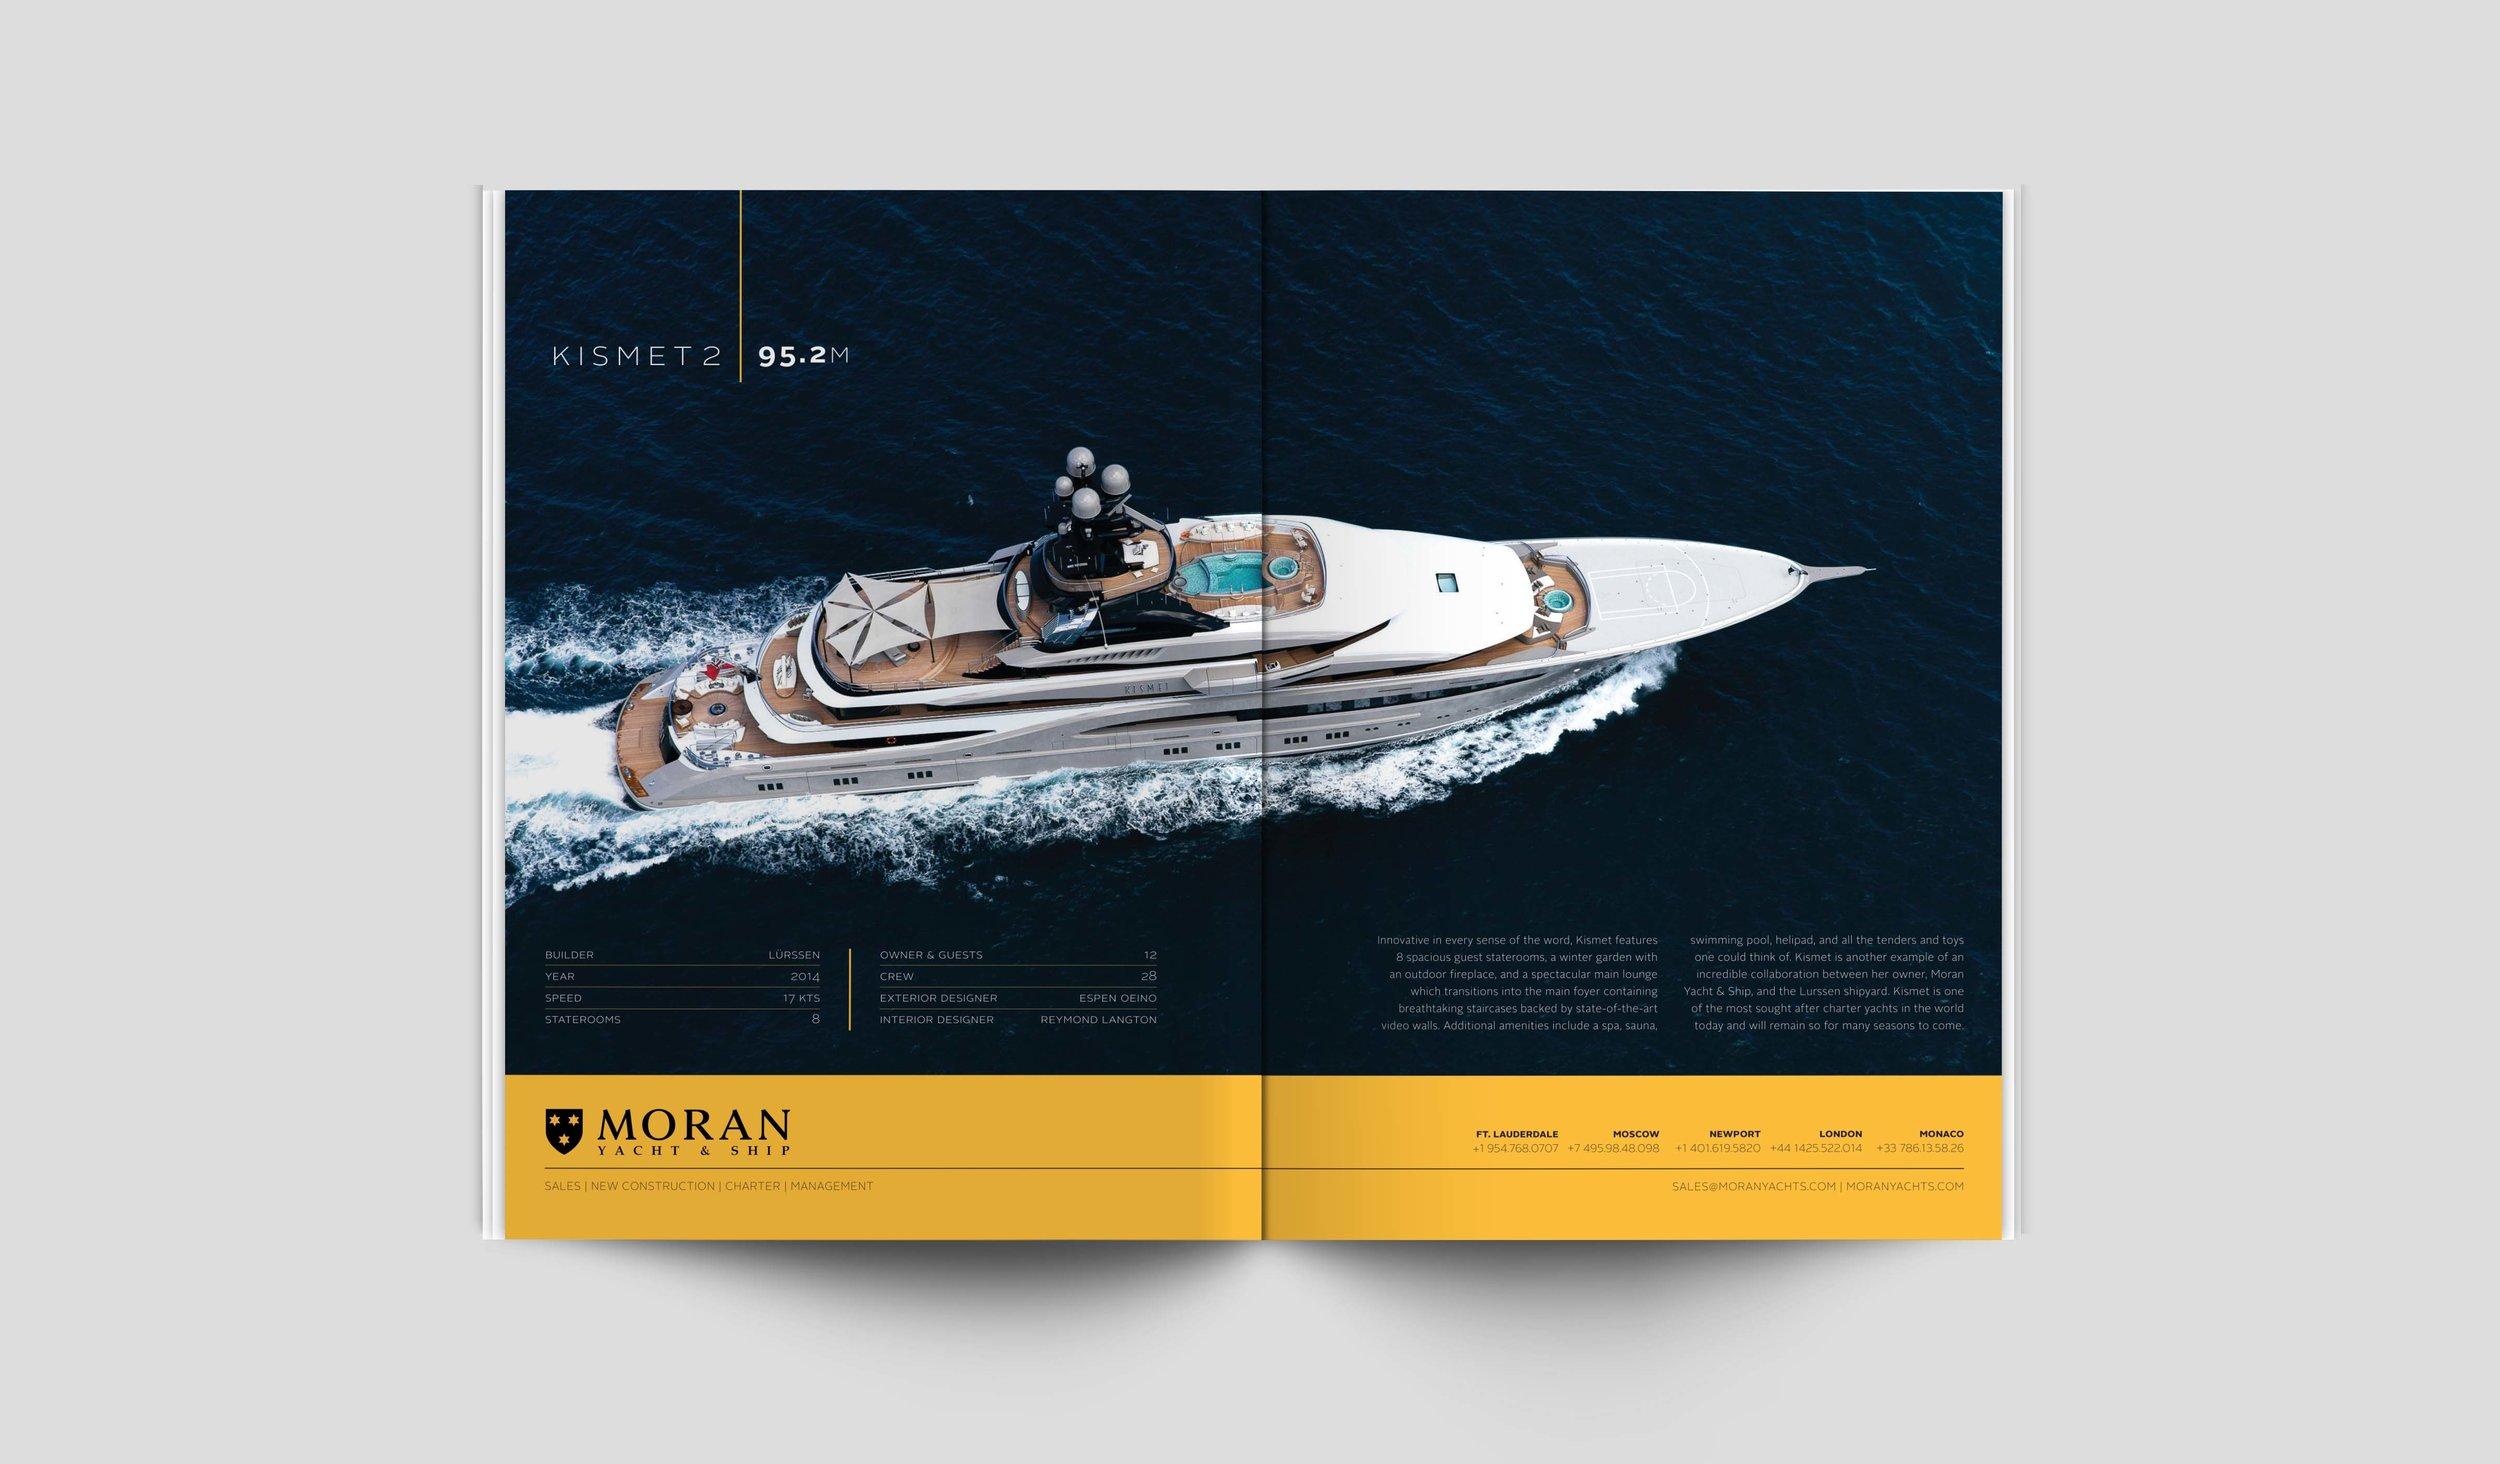 Moran_Company Ad_Spread-1.jpg